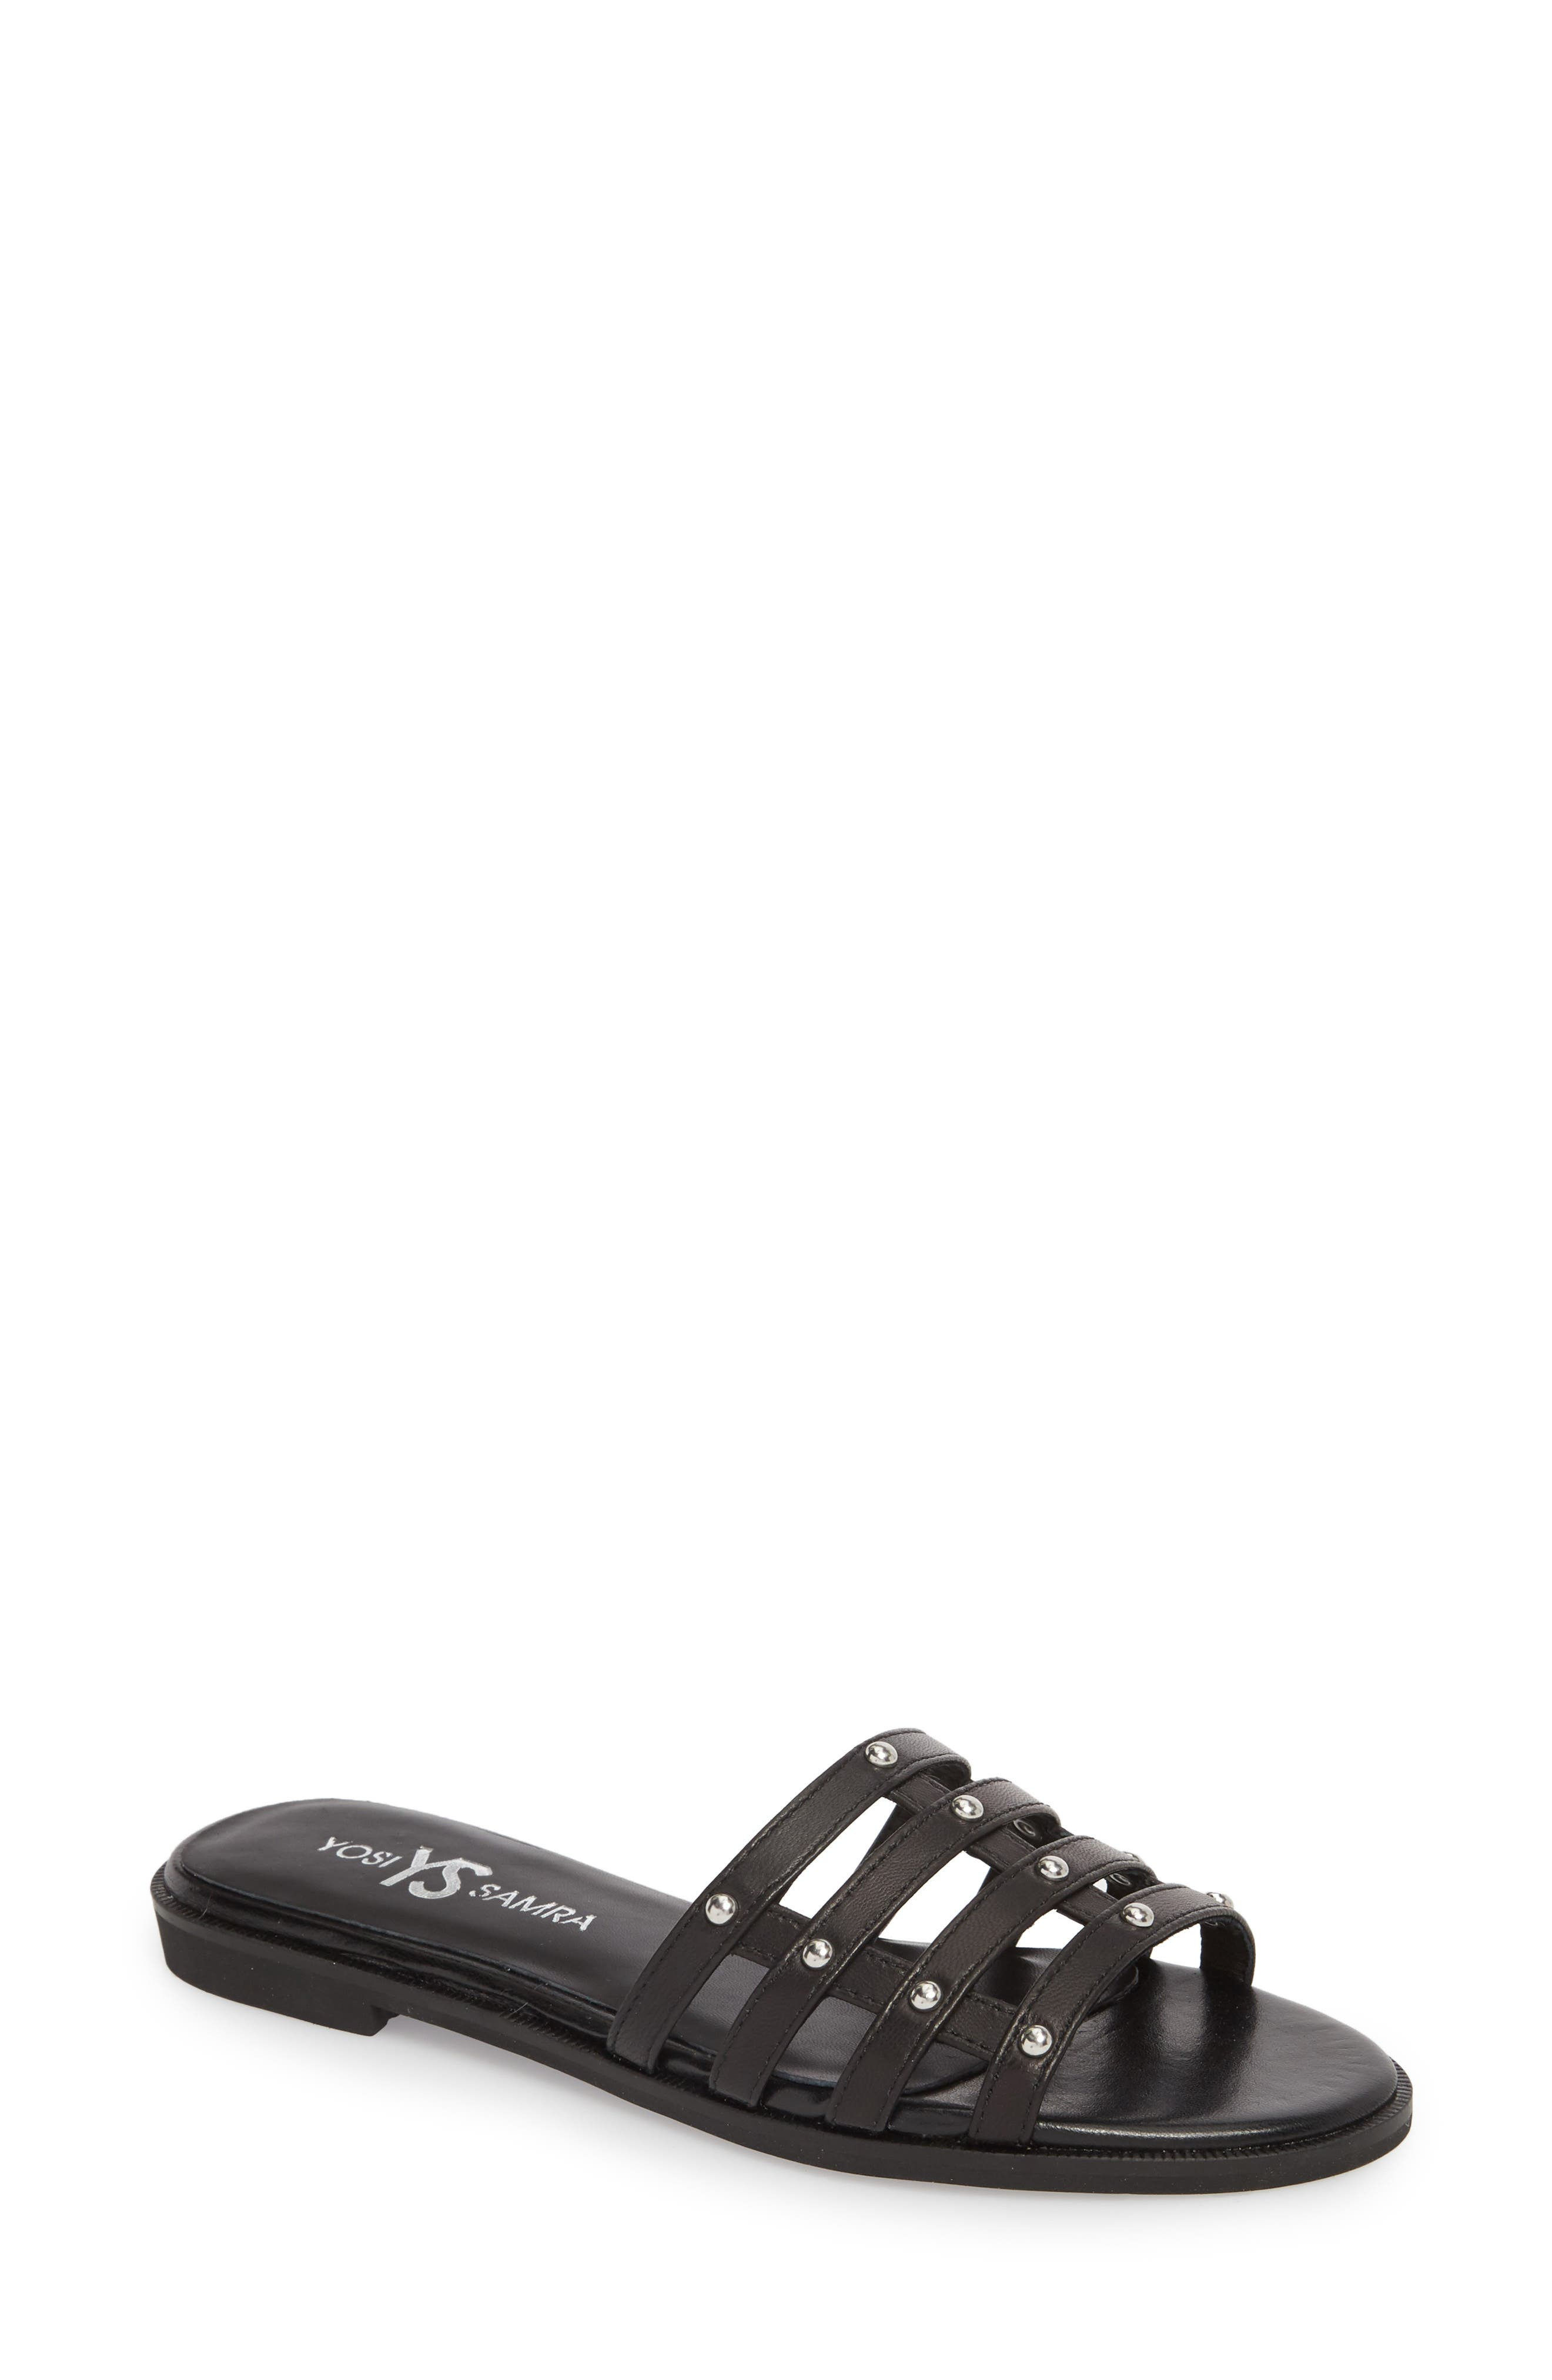 Cara Slide Sandal,                         Main,                         color,